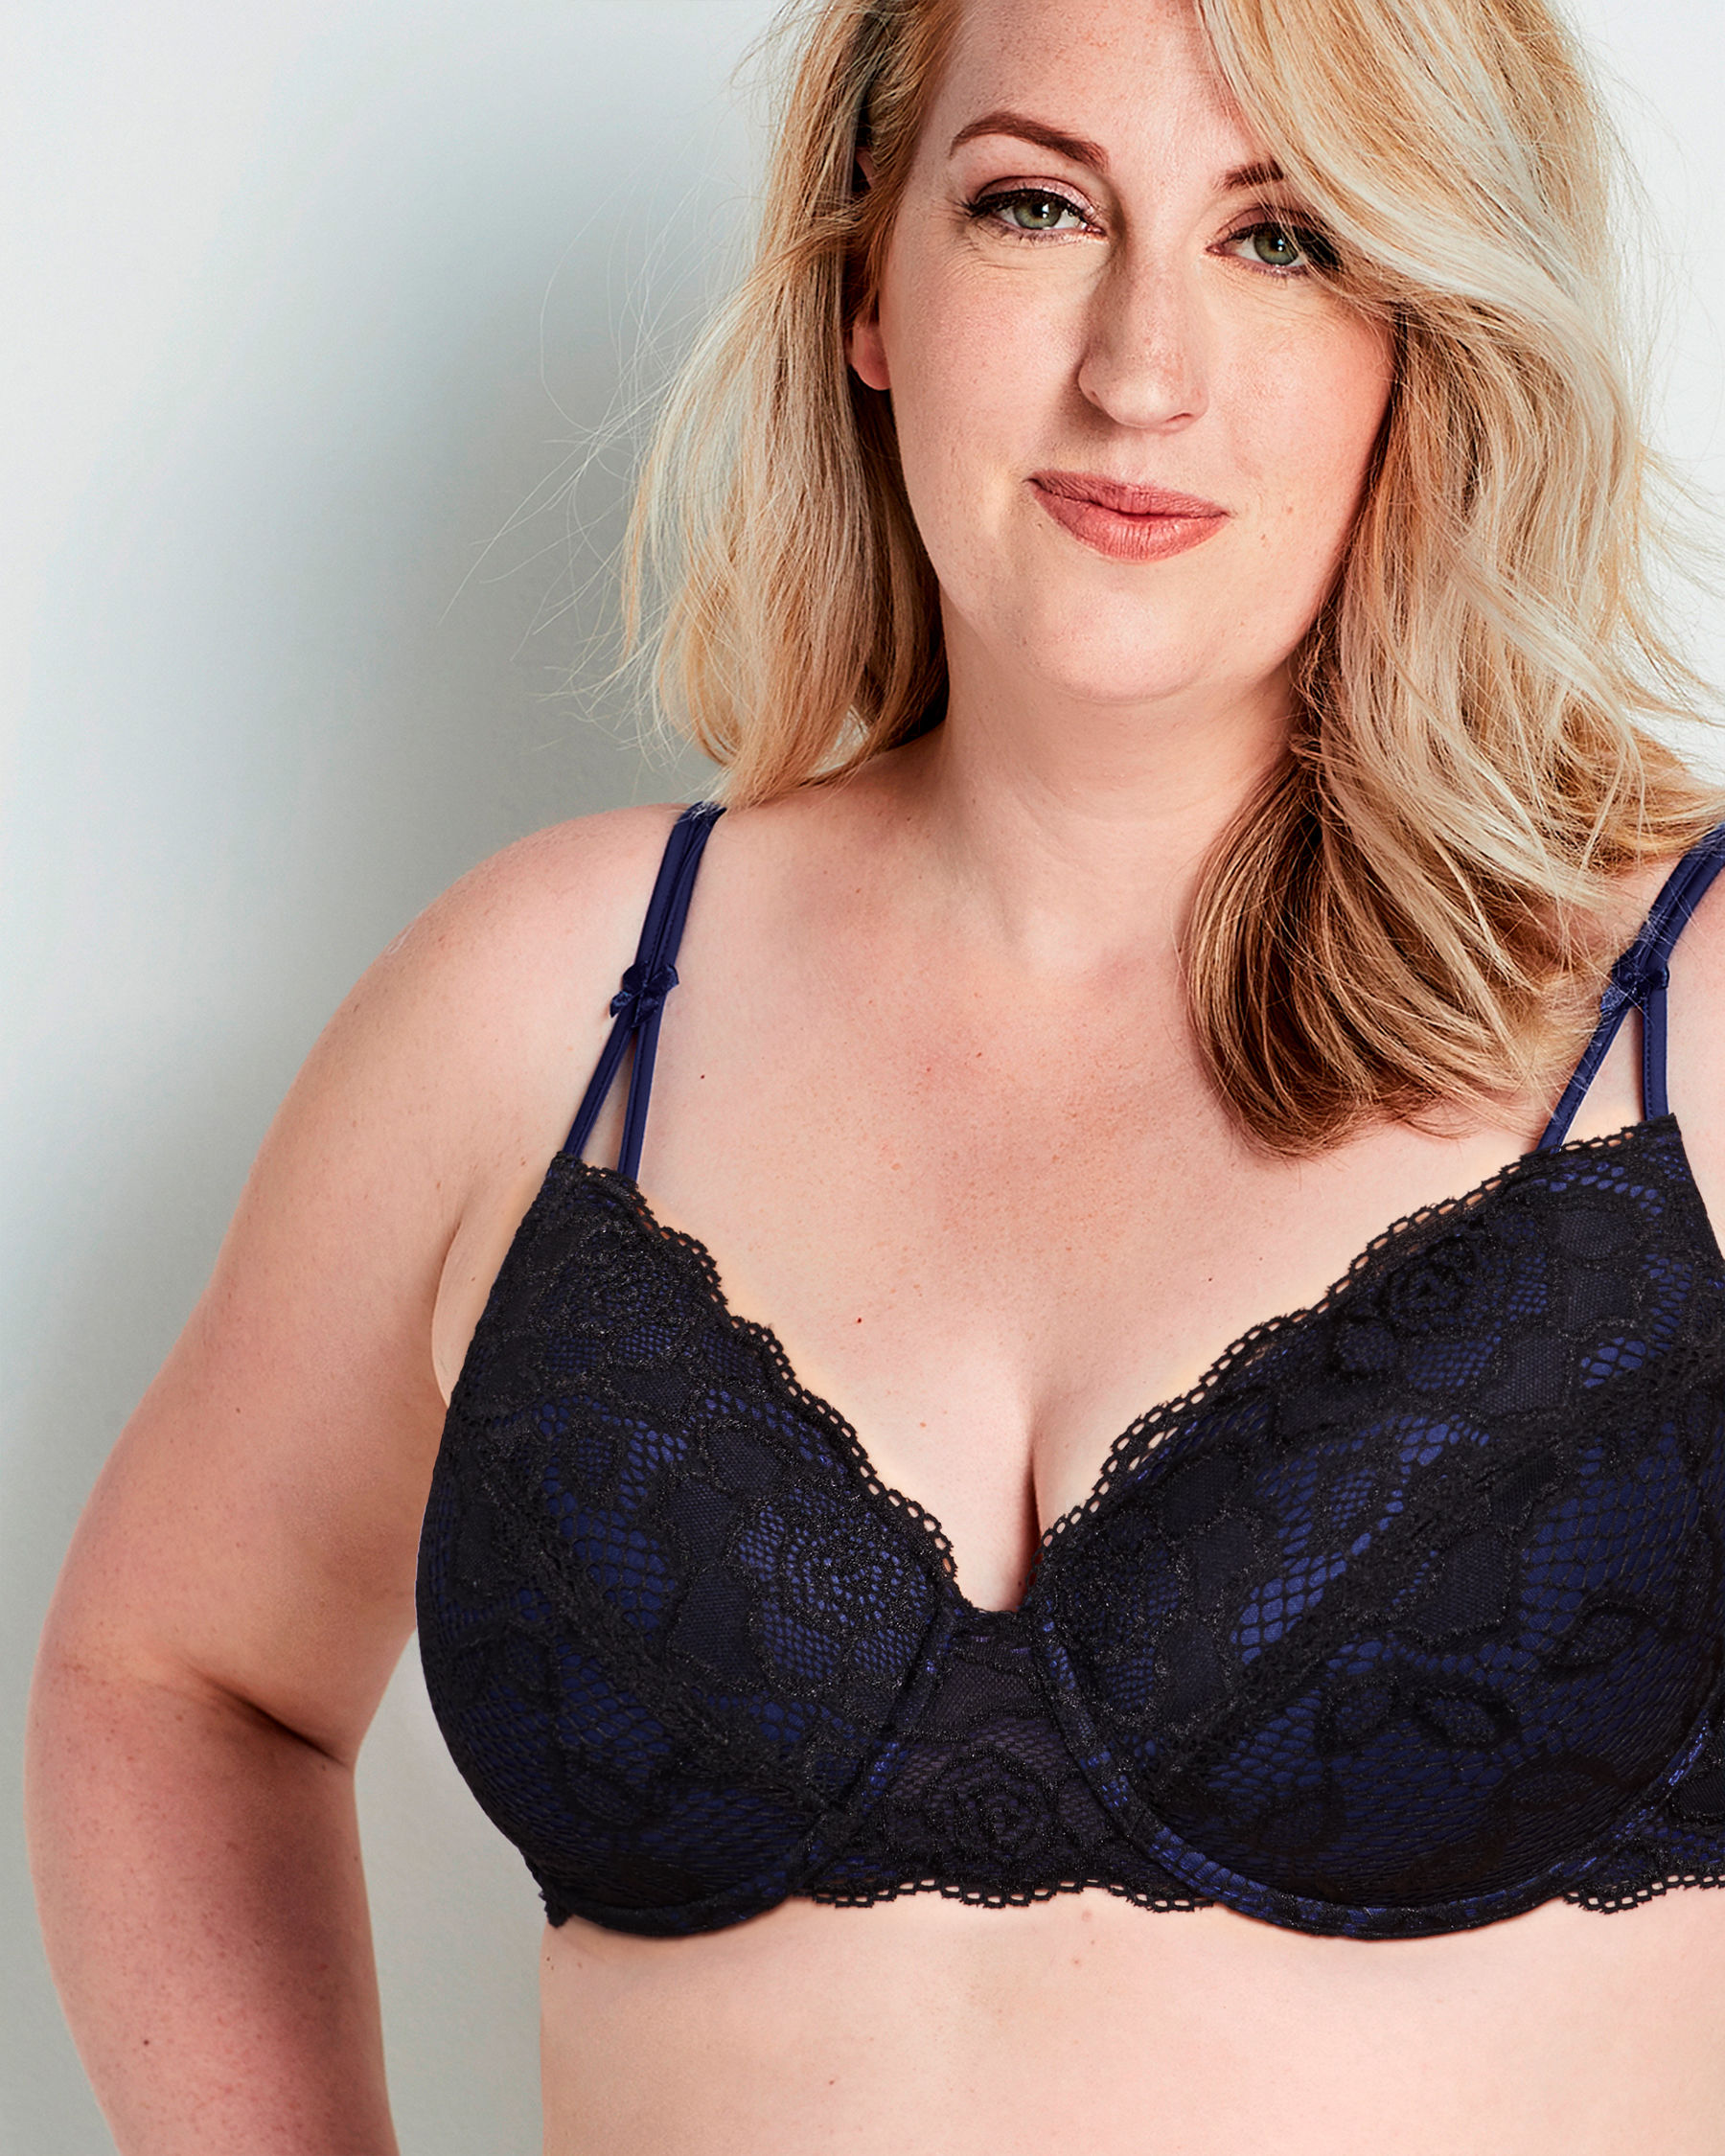 LA VIE EN ROSE Muse Lightly Lined Mastectomy Bra Black 389-110-0-98 - View1